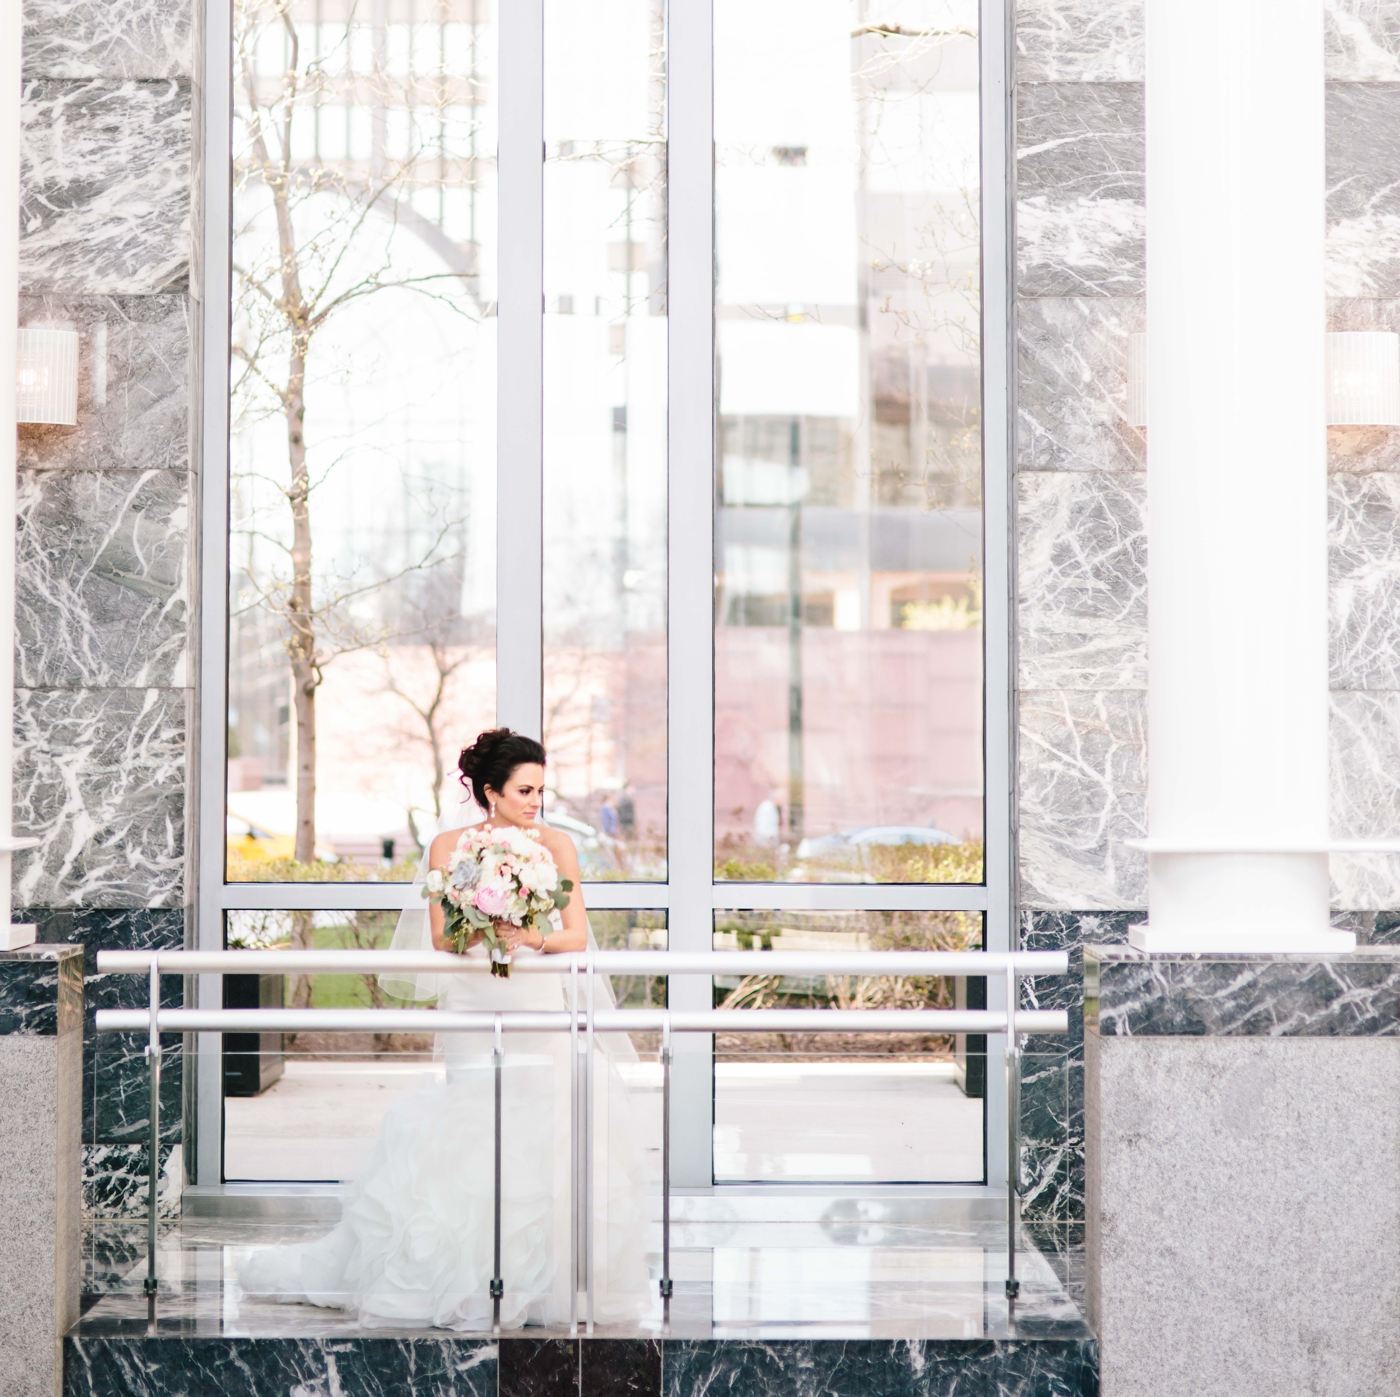 chicago-fine-art-wedding-photography-hamm38